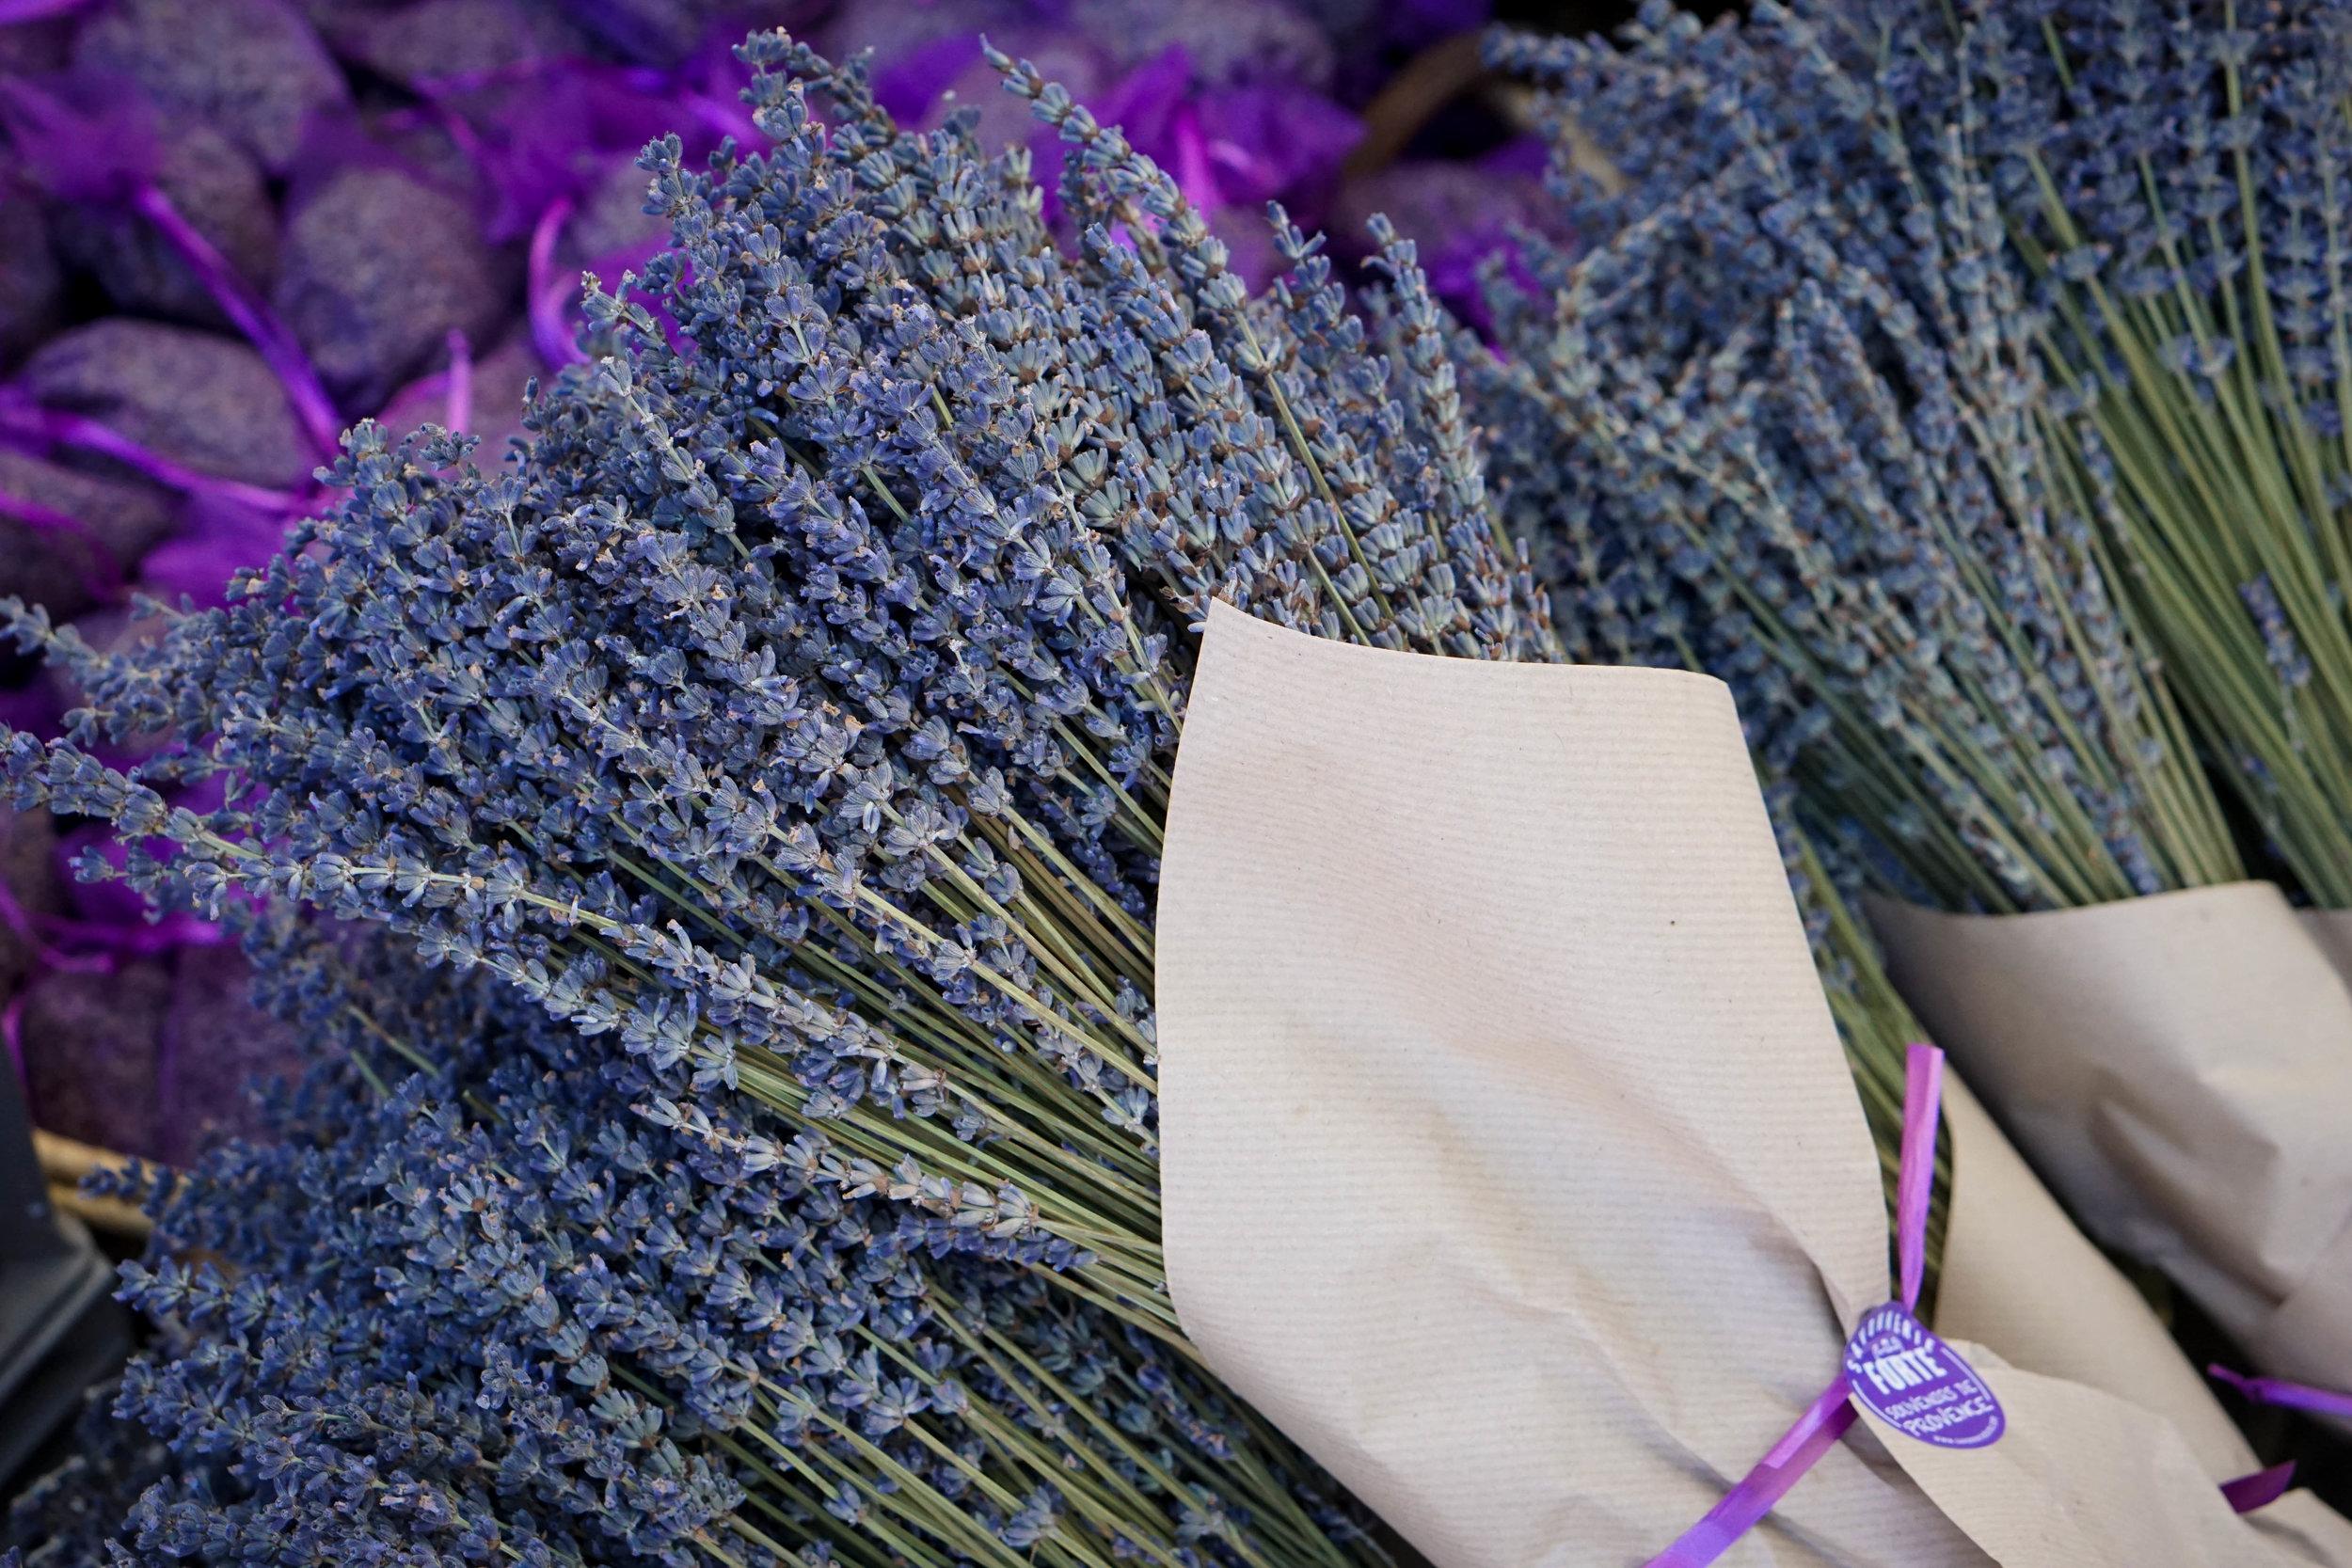 Lavender at the Apt Lavender Festival.